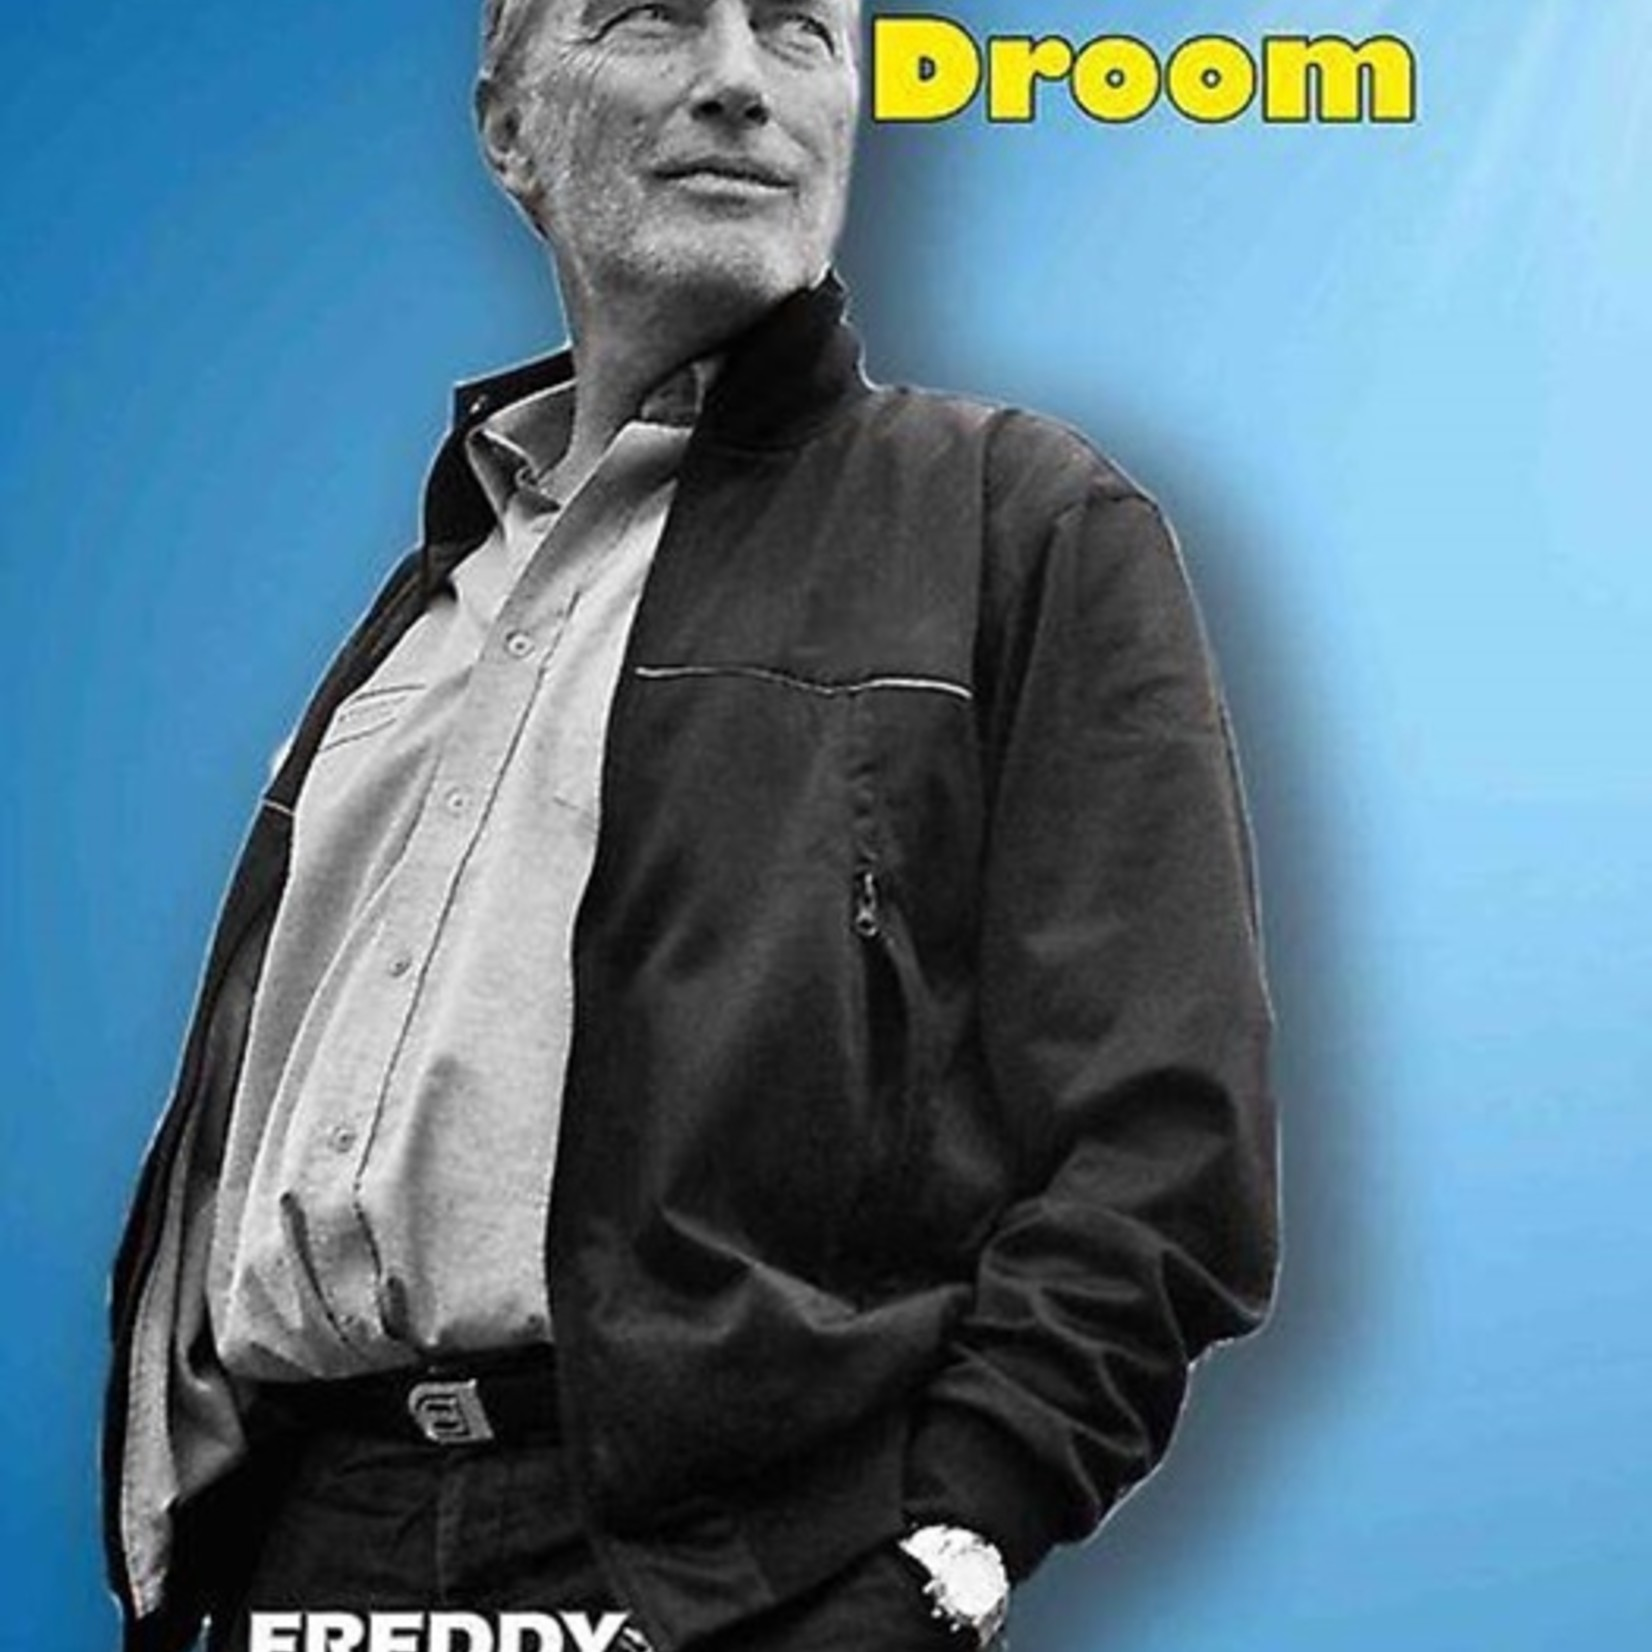 Book 'Velo Droom' (NED)